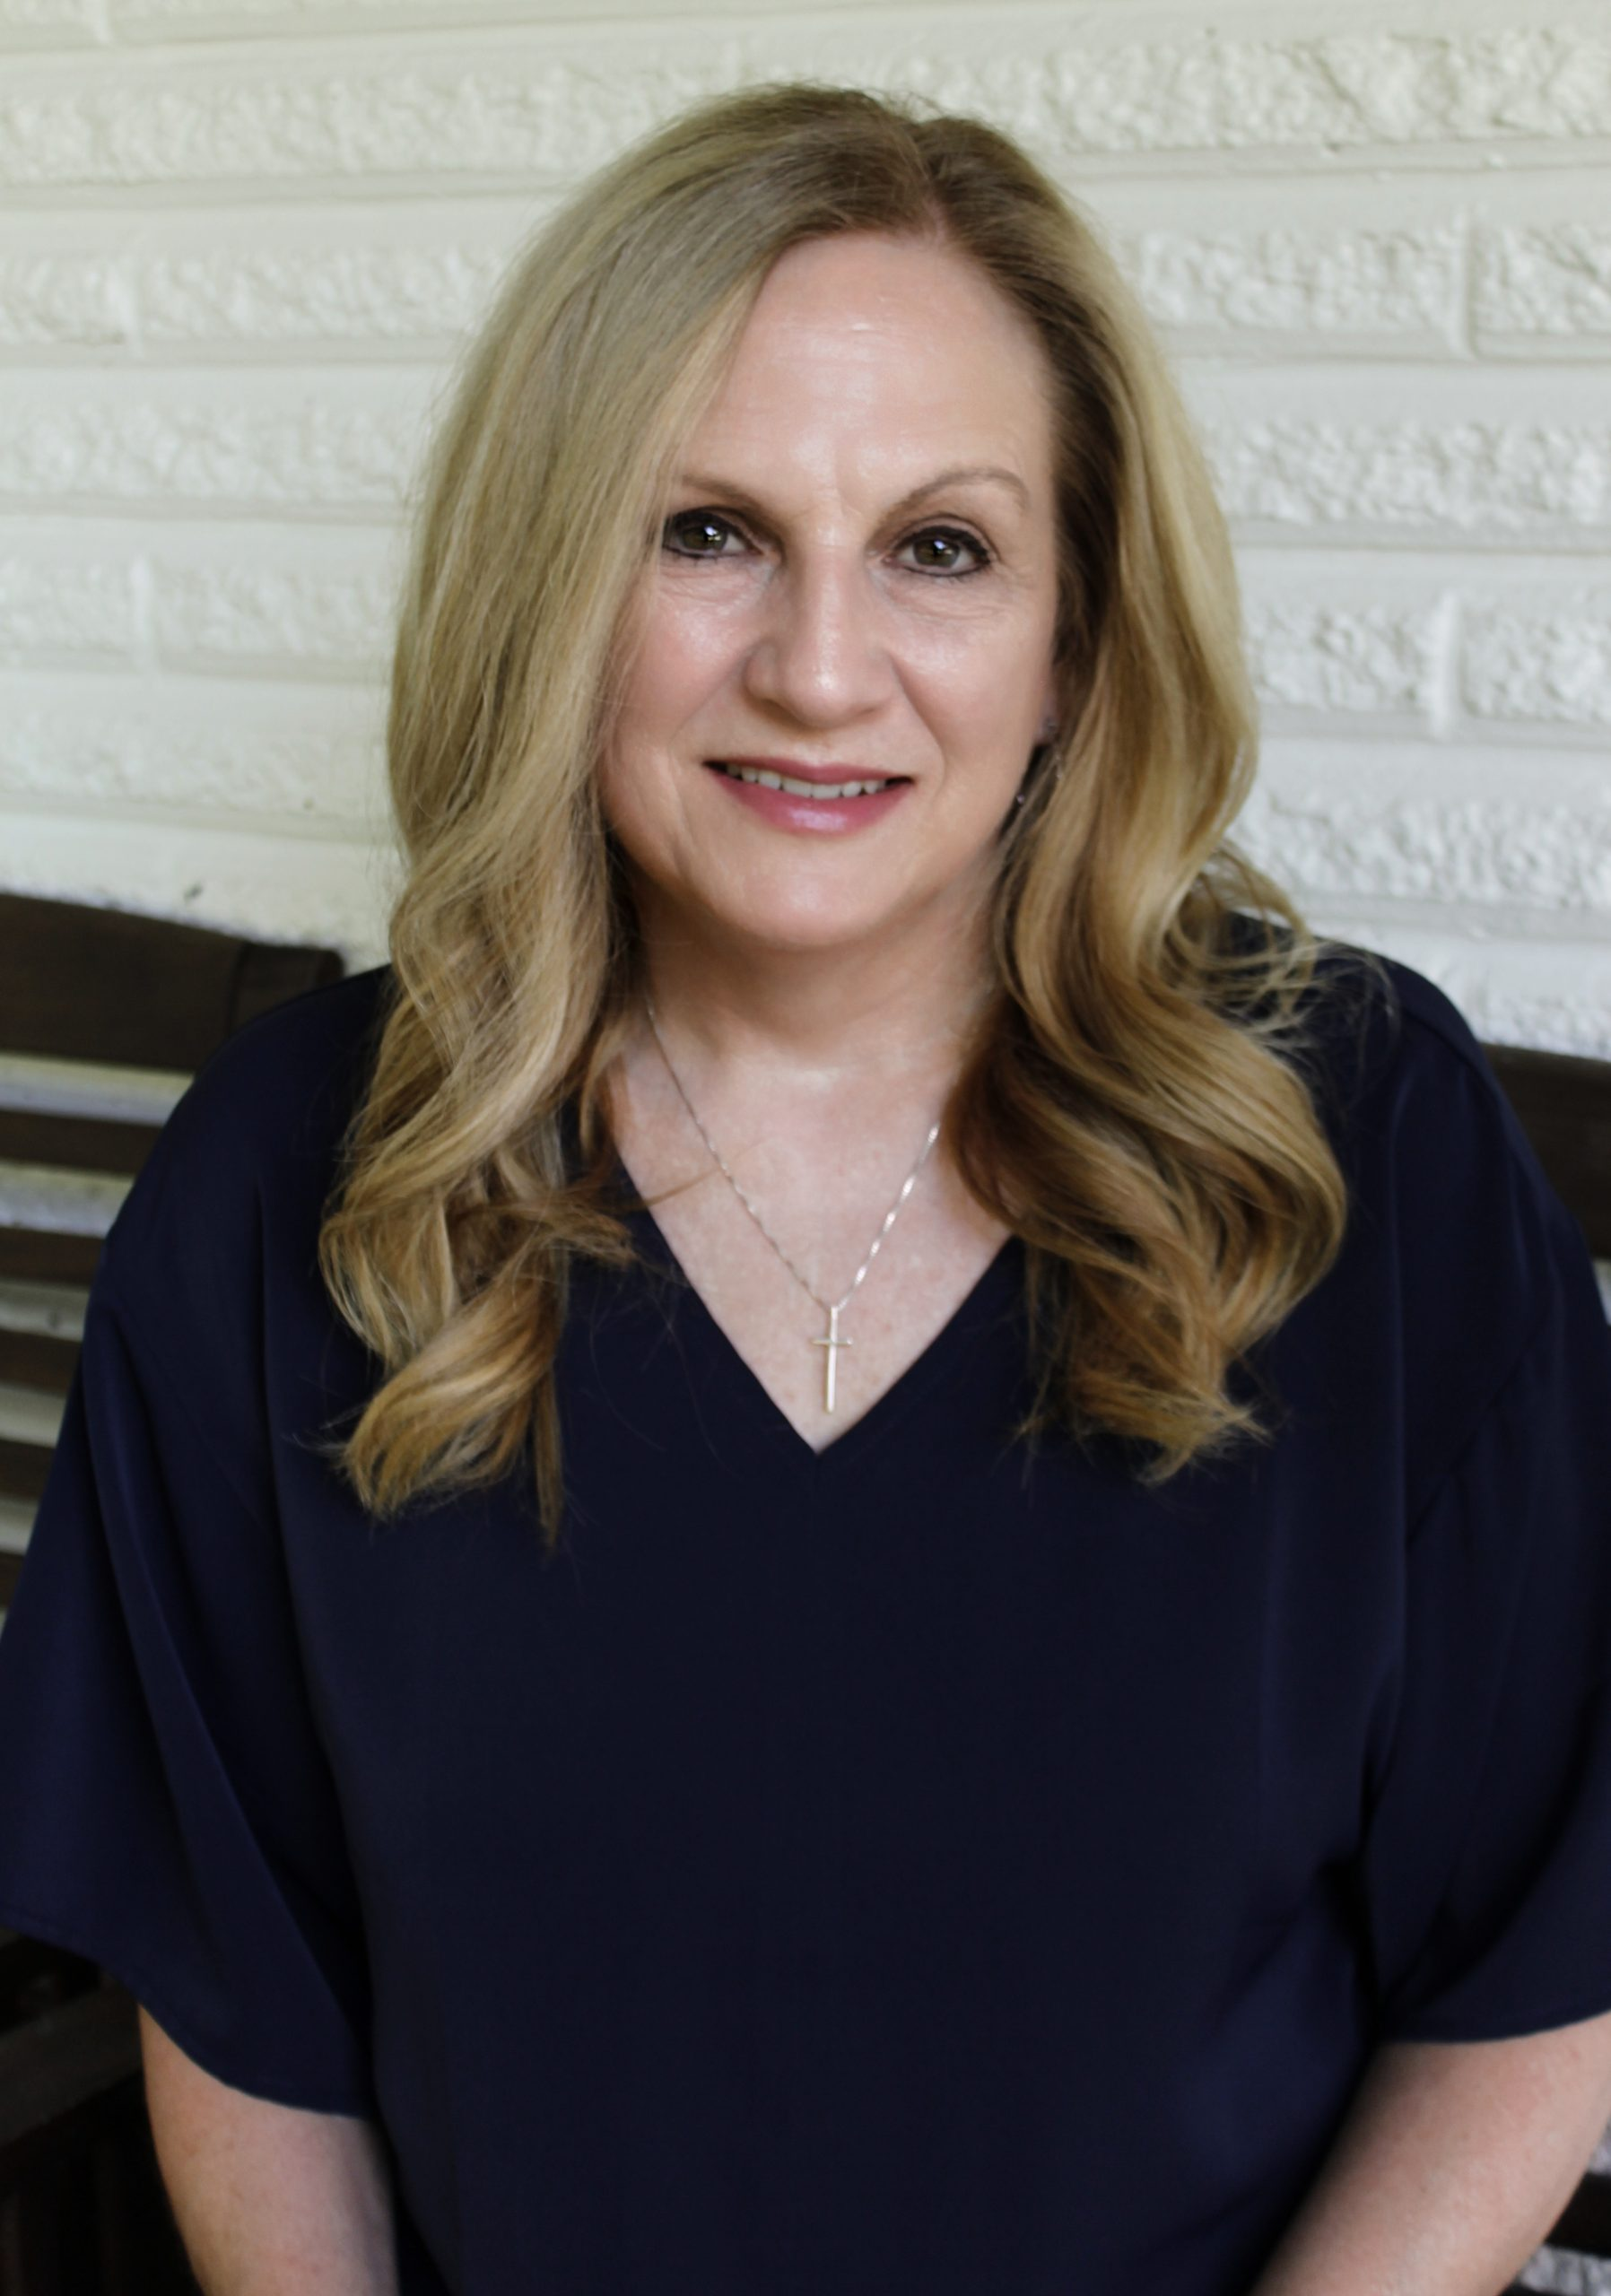 Deb Sieber - Teacher of the Year